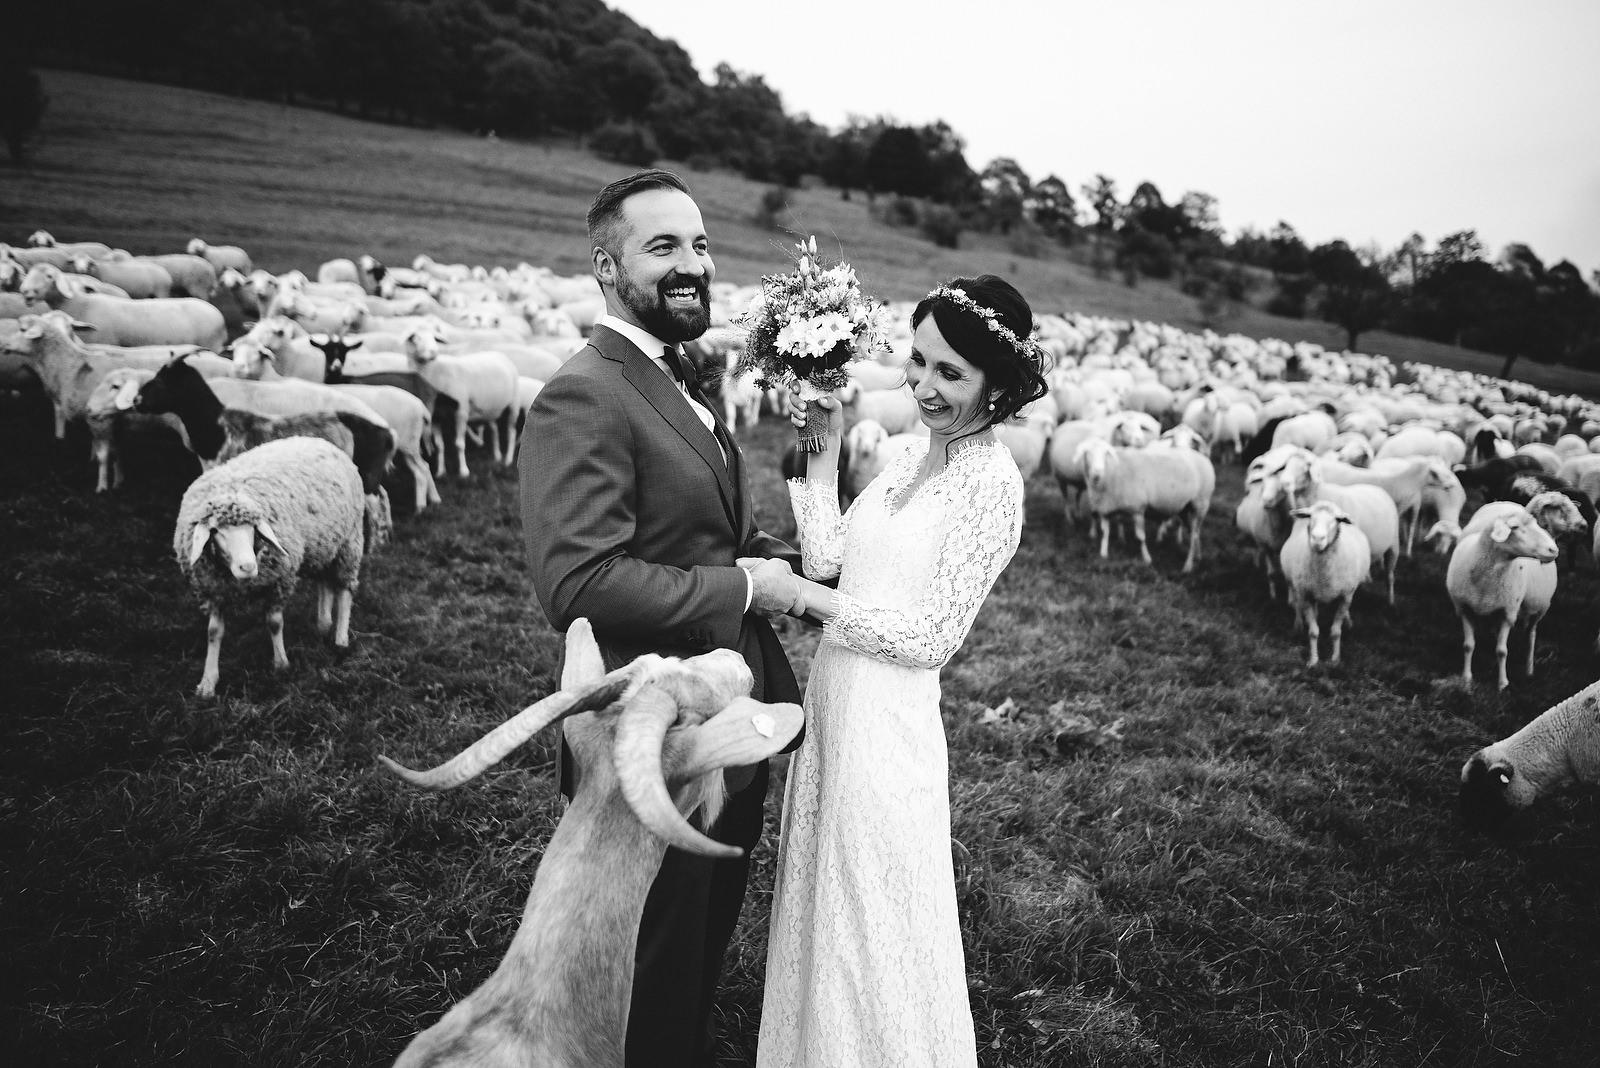 Fotograf Konstanz - Hochzeitsfotograf Reutlingen Achalm Hochzeit EFP 86 - Als Hochzeitsfotograf auf der Achalm, Reutlingen  - 71 -